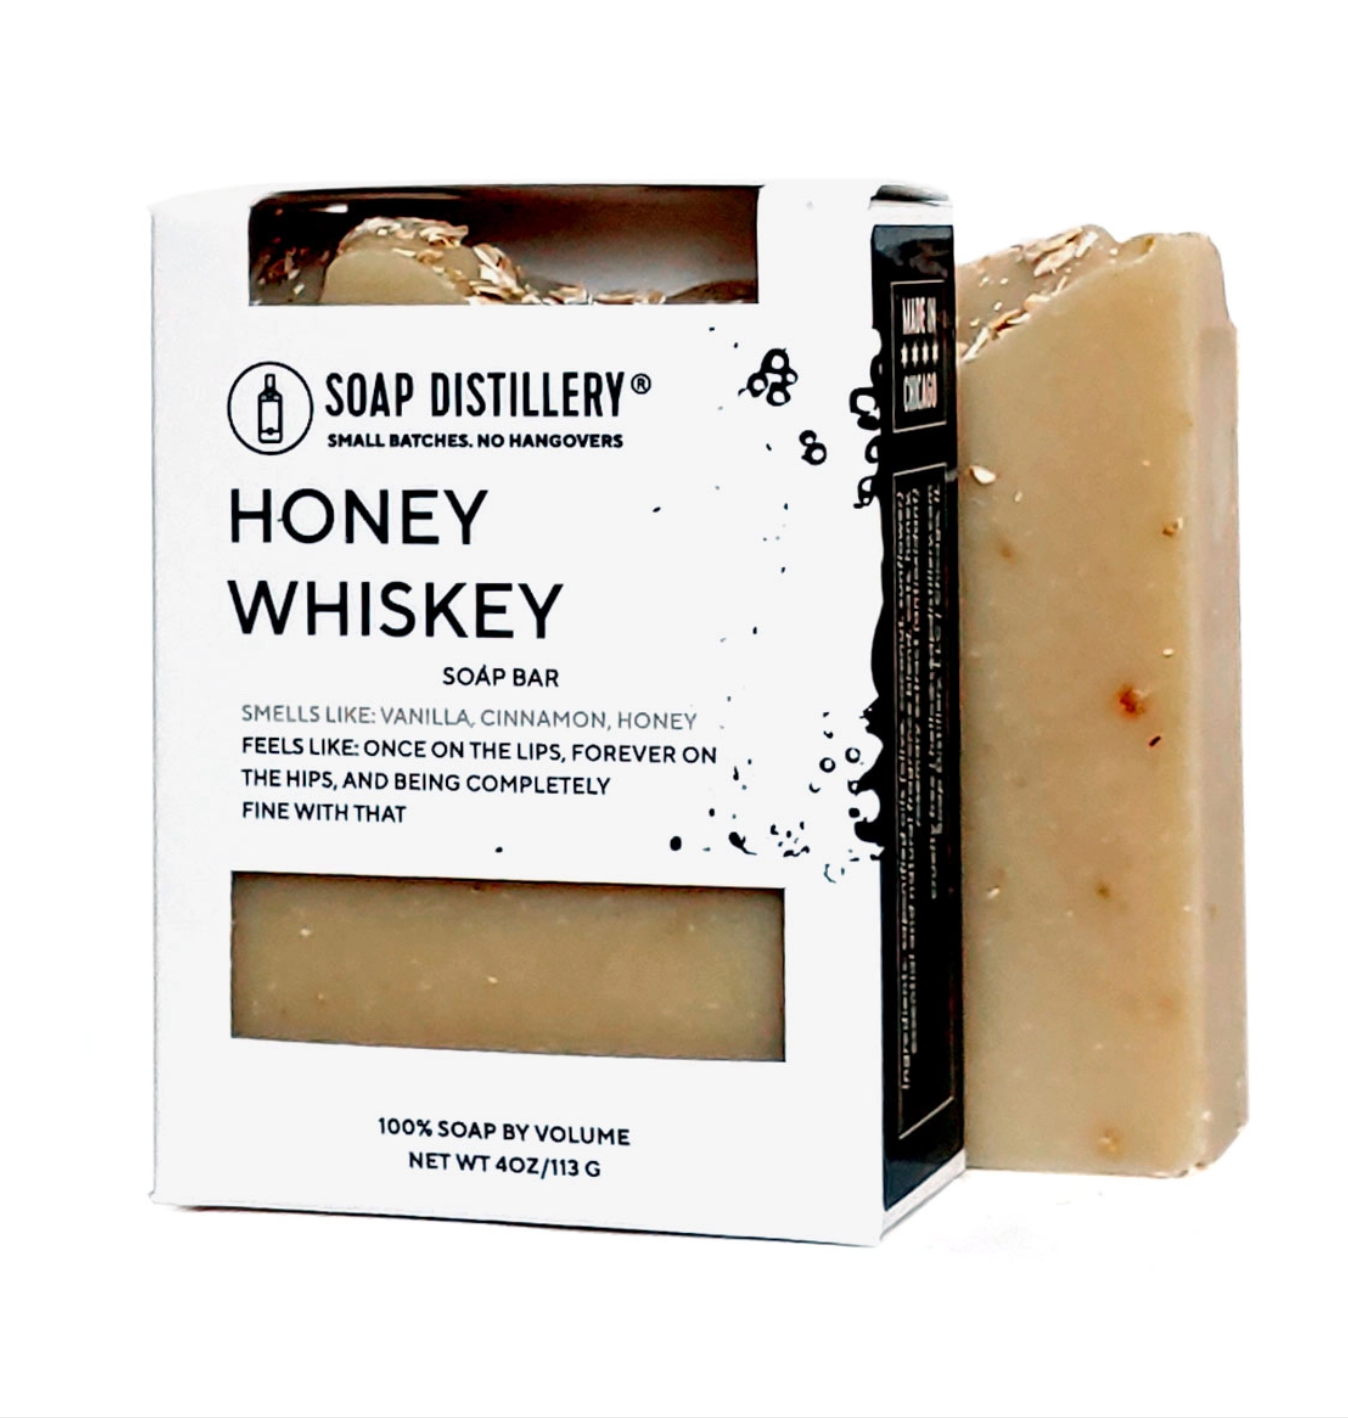 Soap Distillery Honey Whiskey Soap Bar